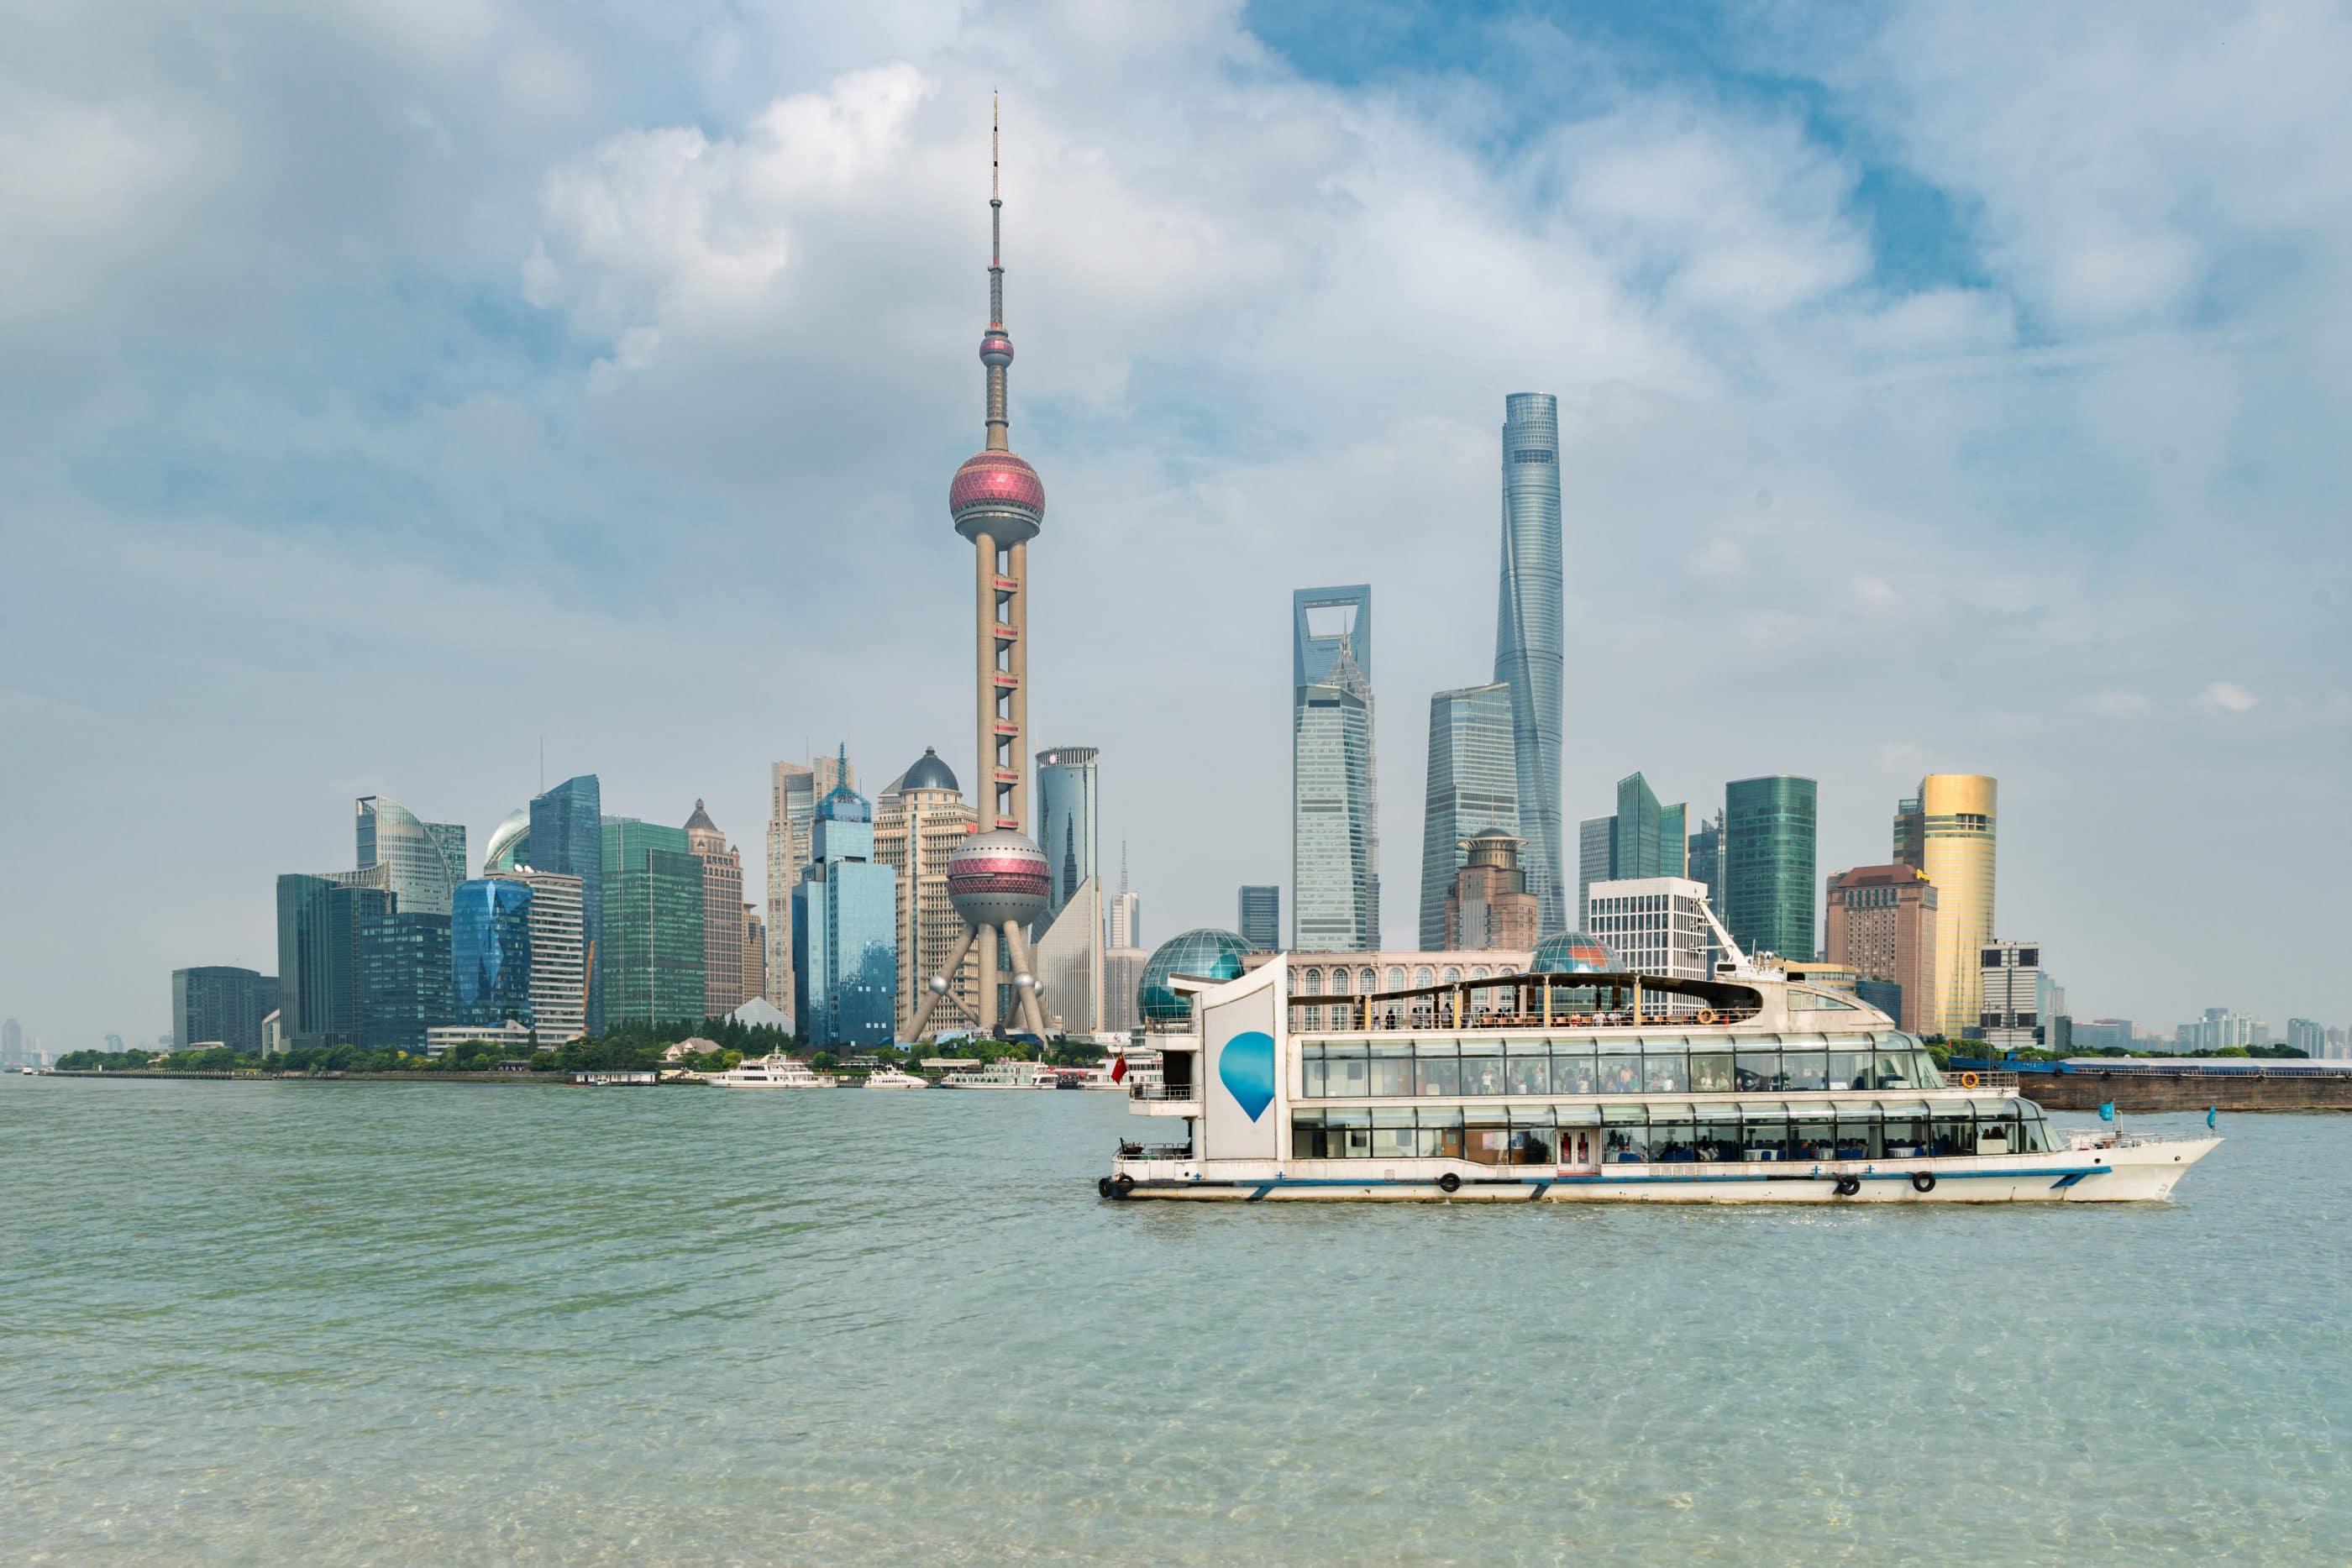 Things to do in Shanghai: Huangpu River Cruise